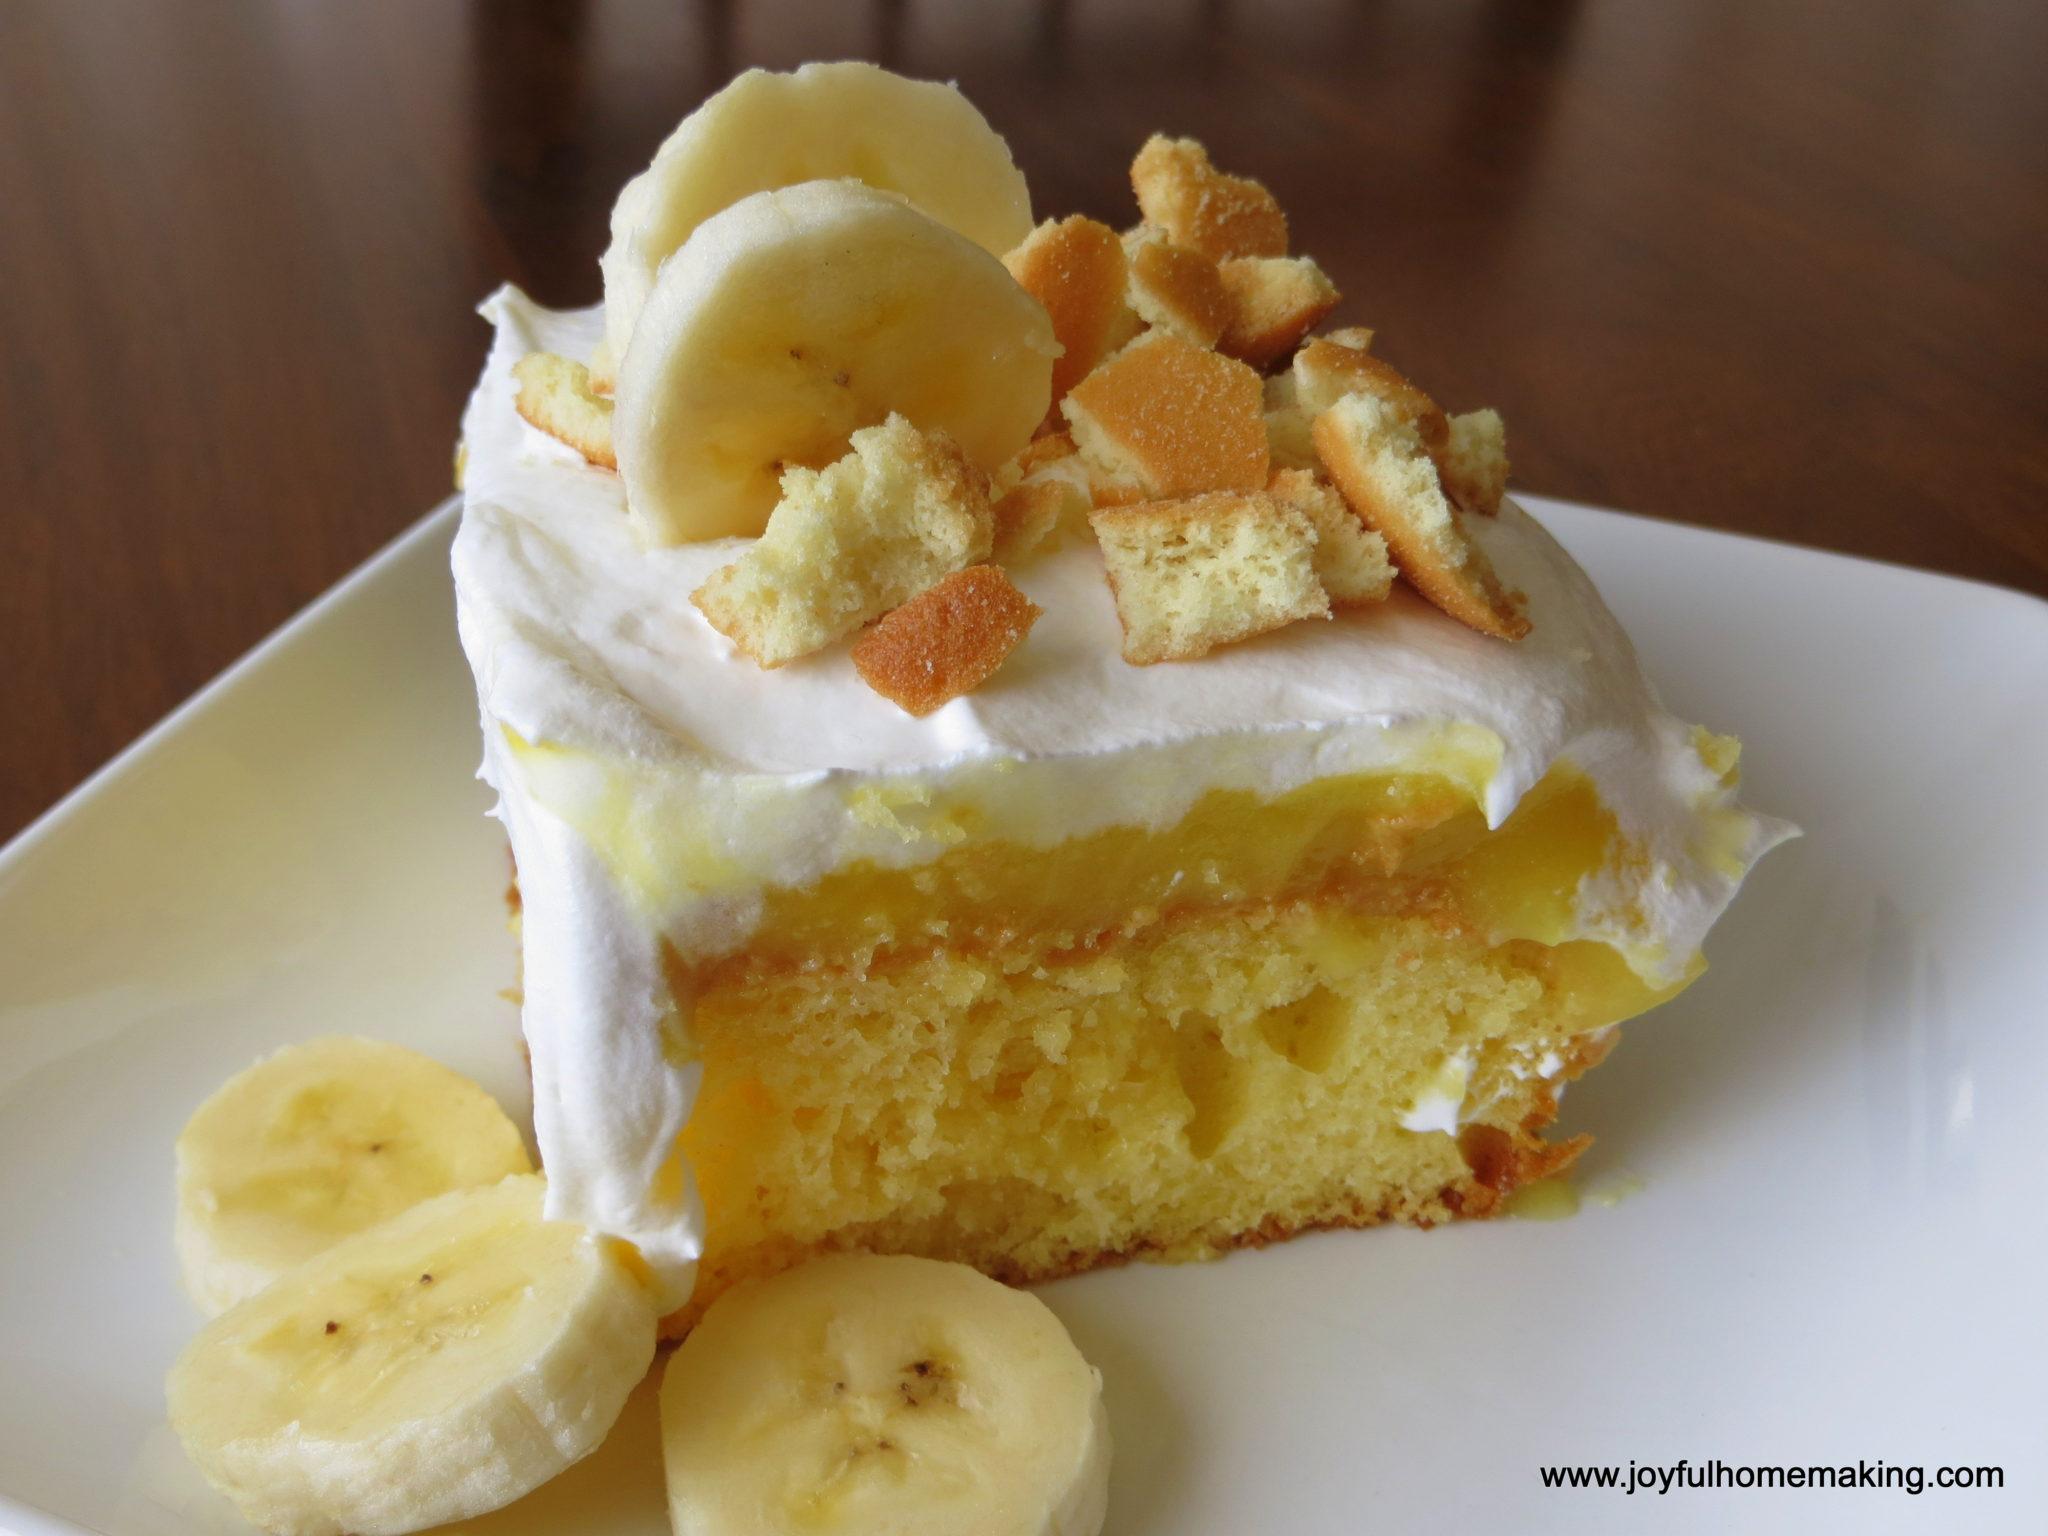 https://joyfulhomemaking.com/2013/07/banana-pudding-poke-cake.html